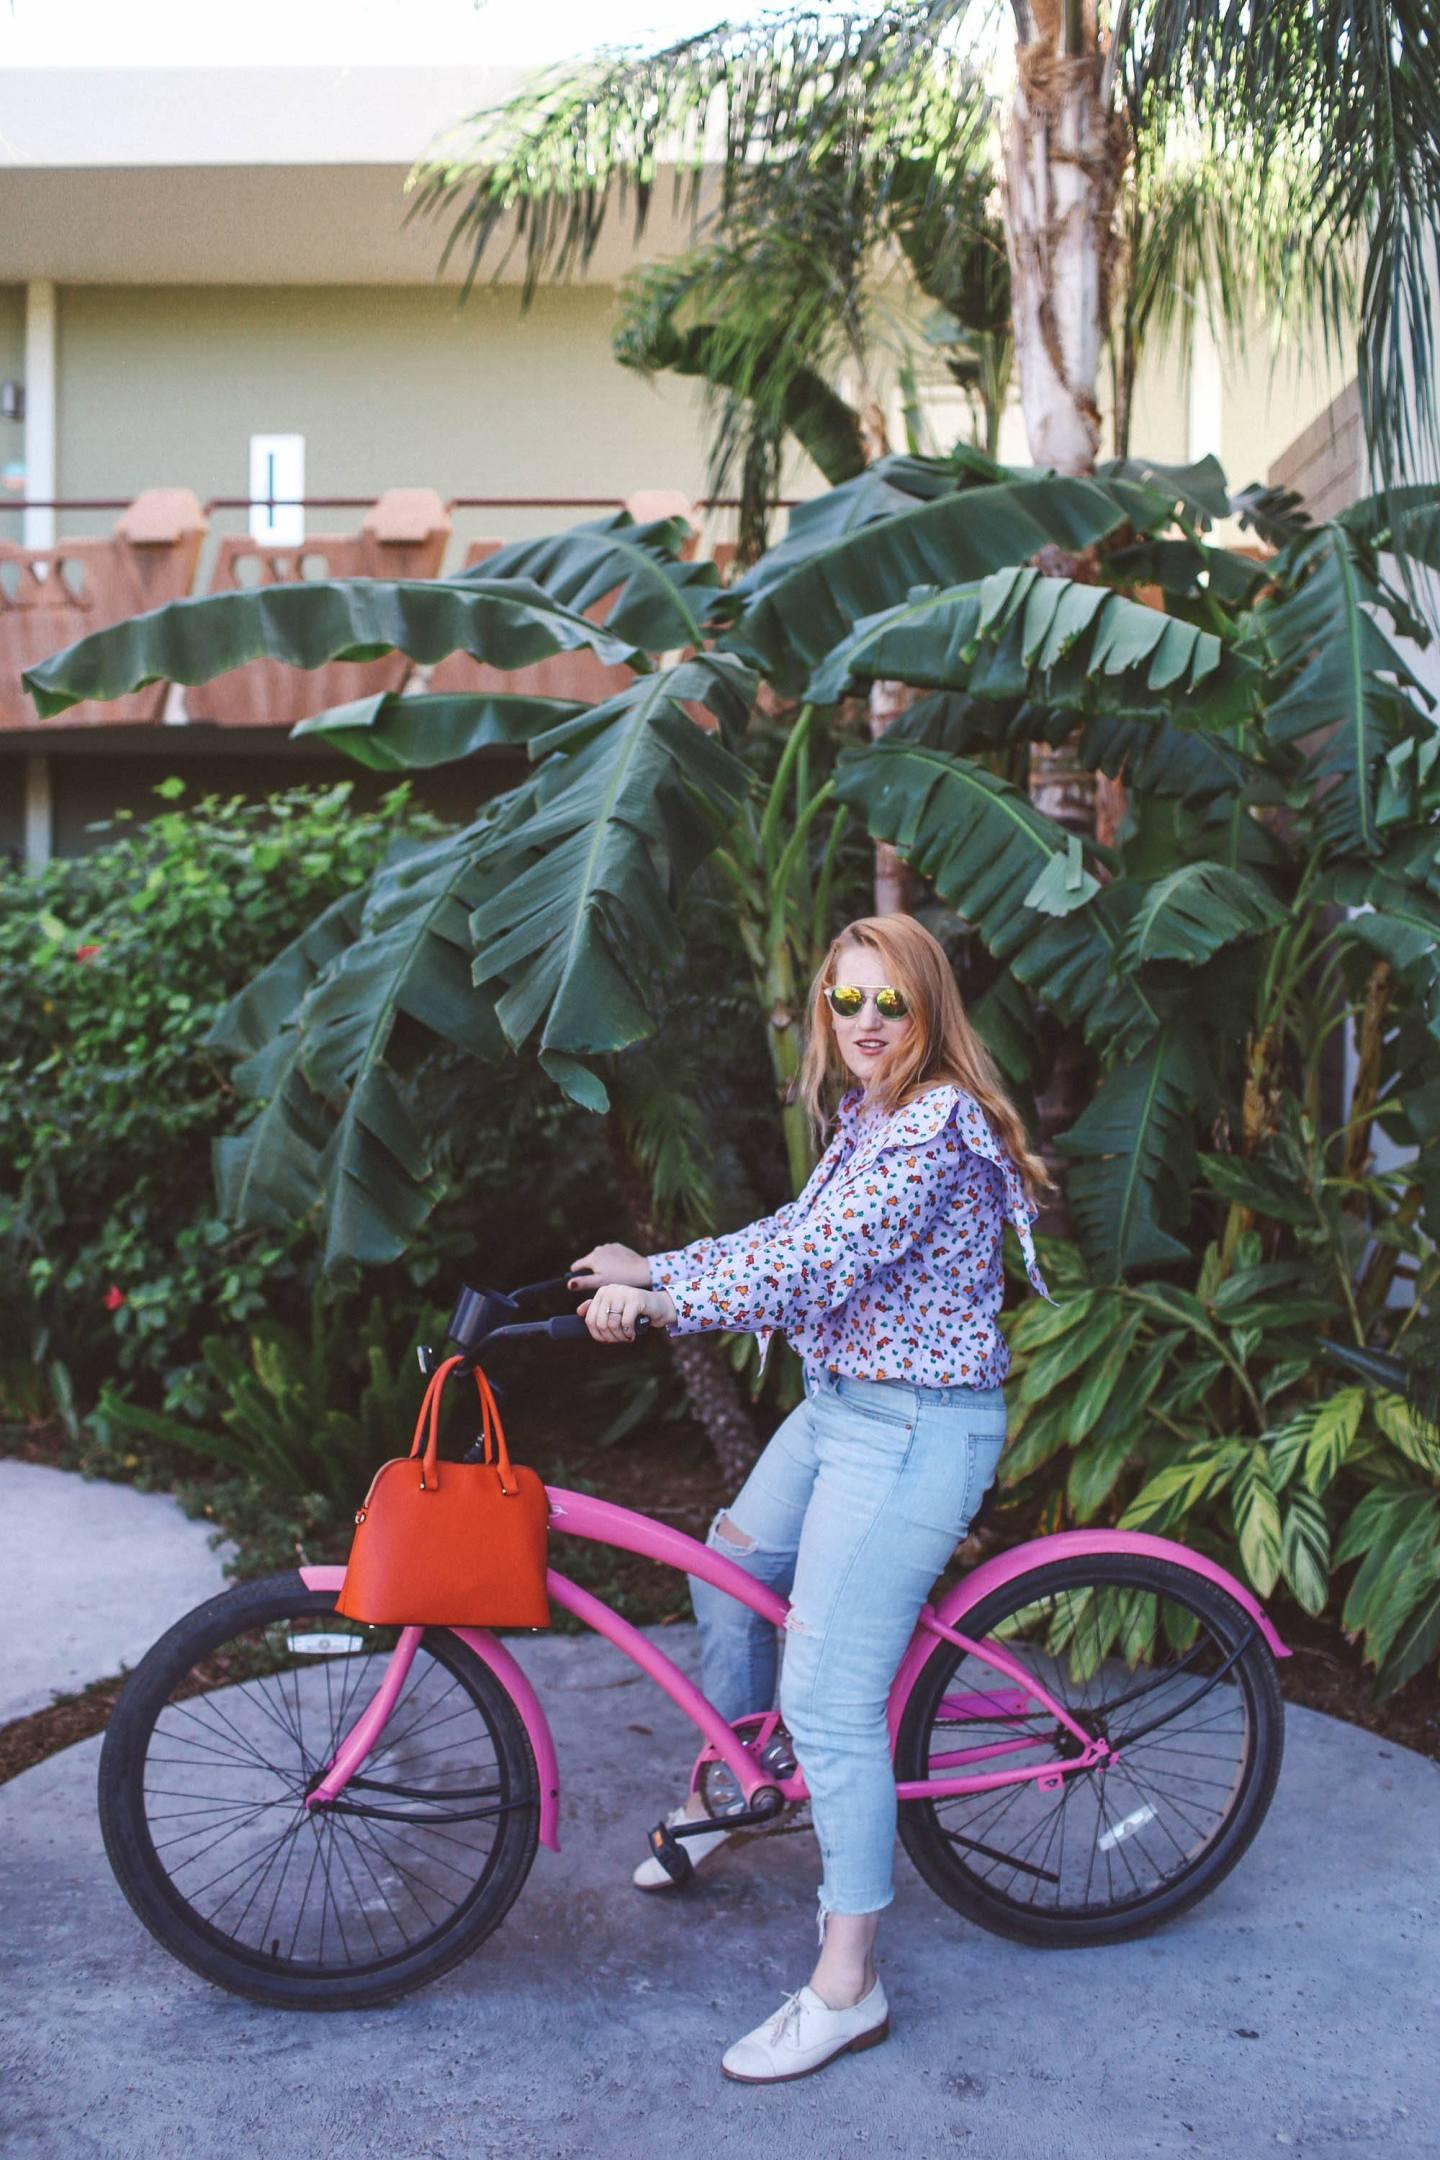 purple ruffle top pink bike palm trees